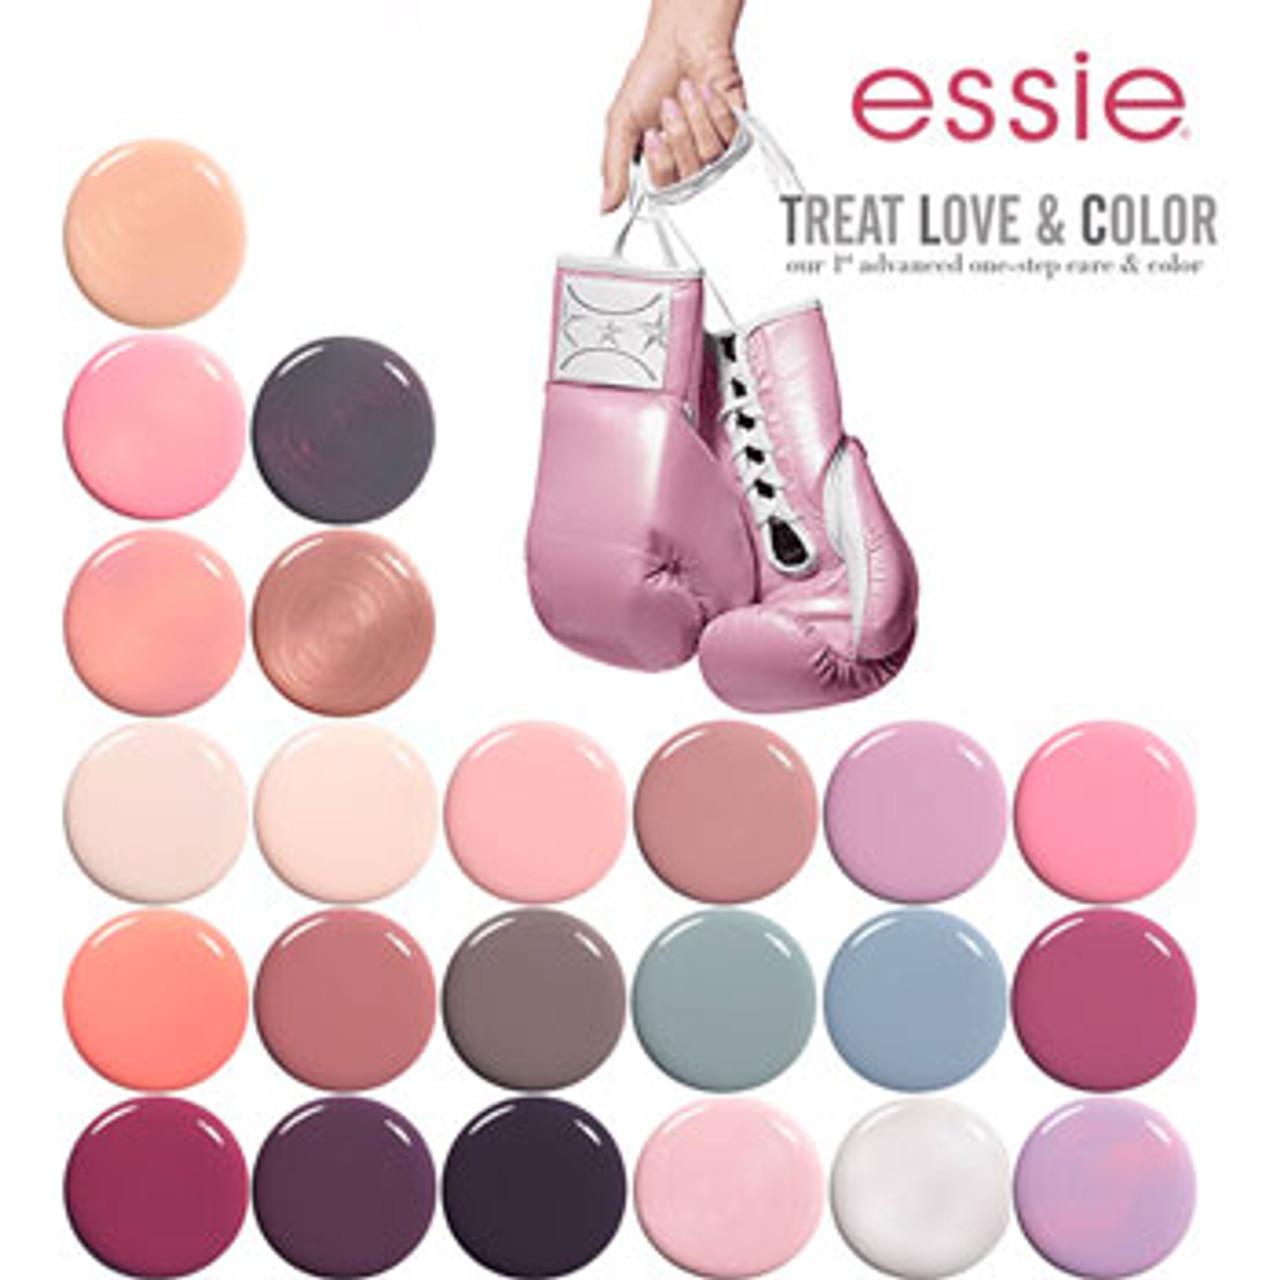 Essie Treat Love & Color - 0.46 oz